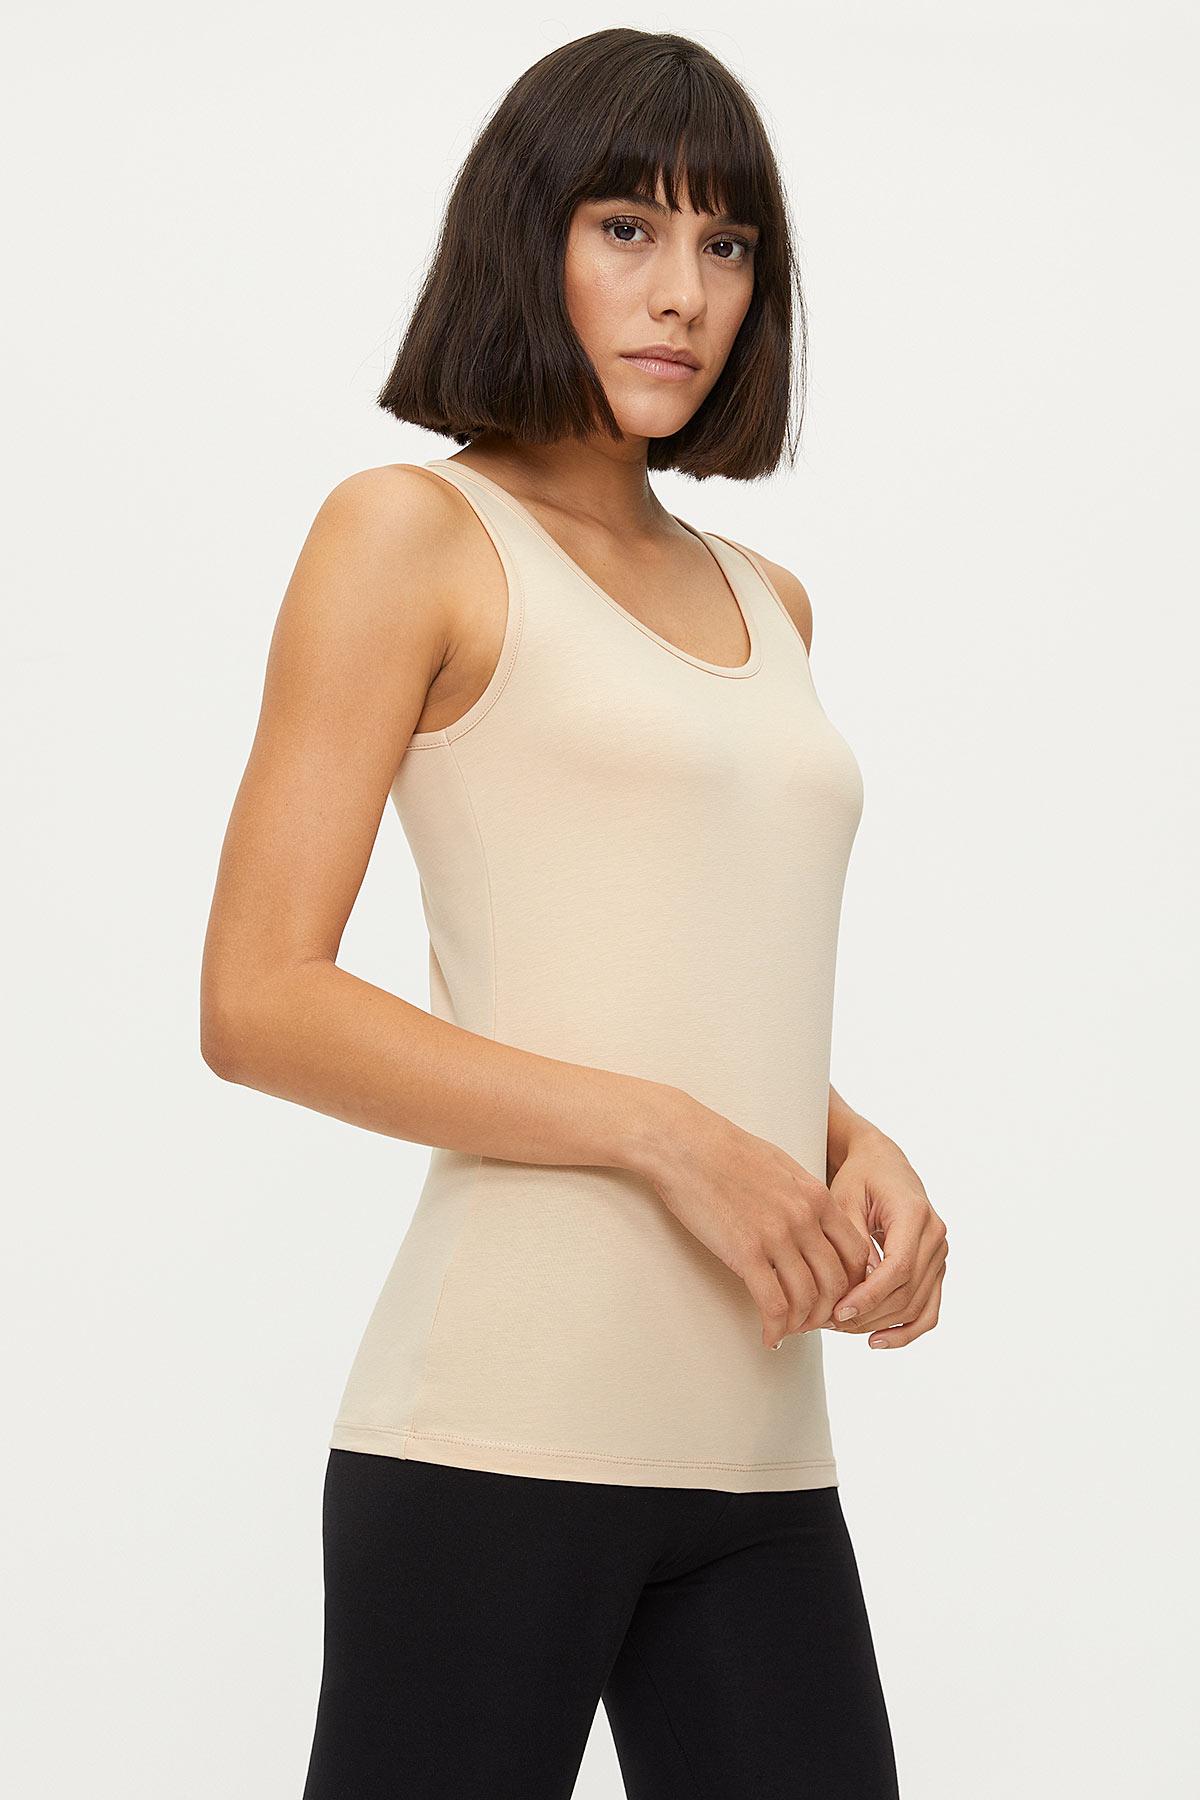 1247 Lycra Wide Strappy Women's Undershirt